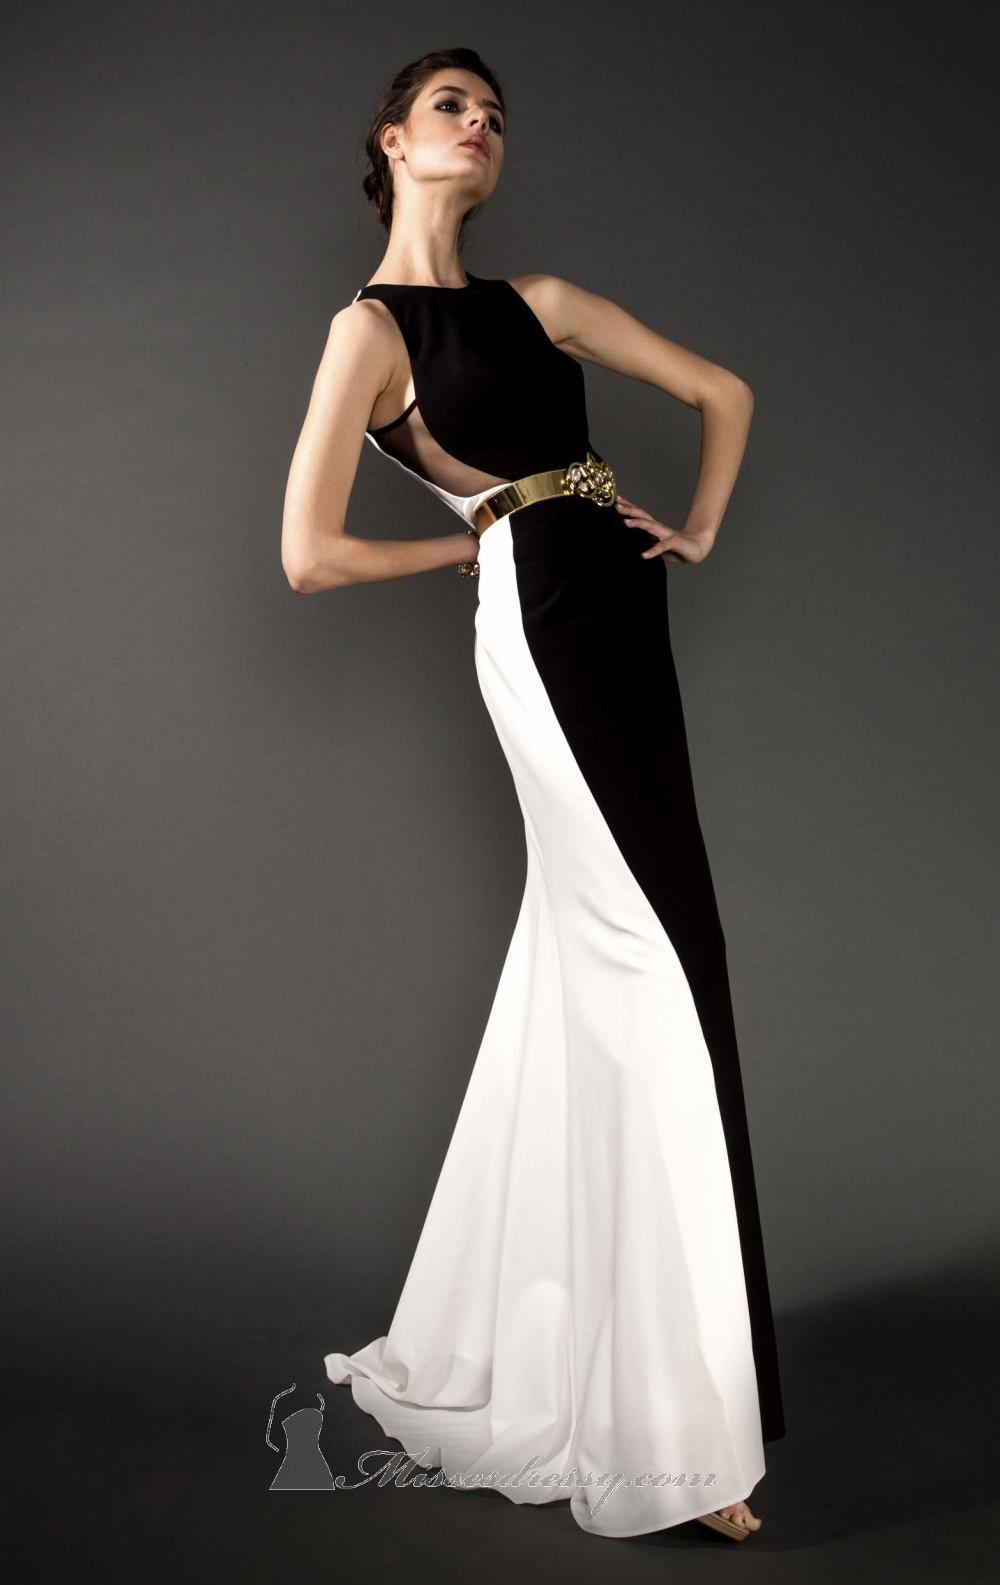 White Gold Slim Black Colourblock Dress By Paula Richi | Dresses ...